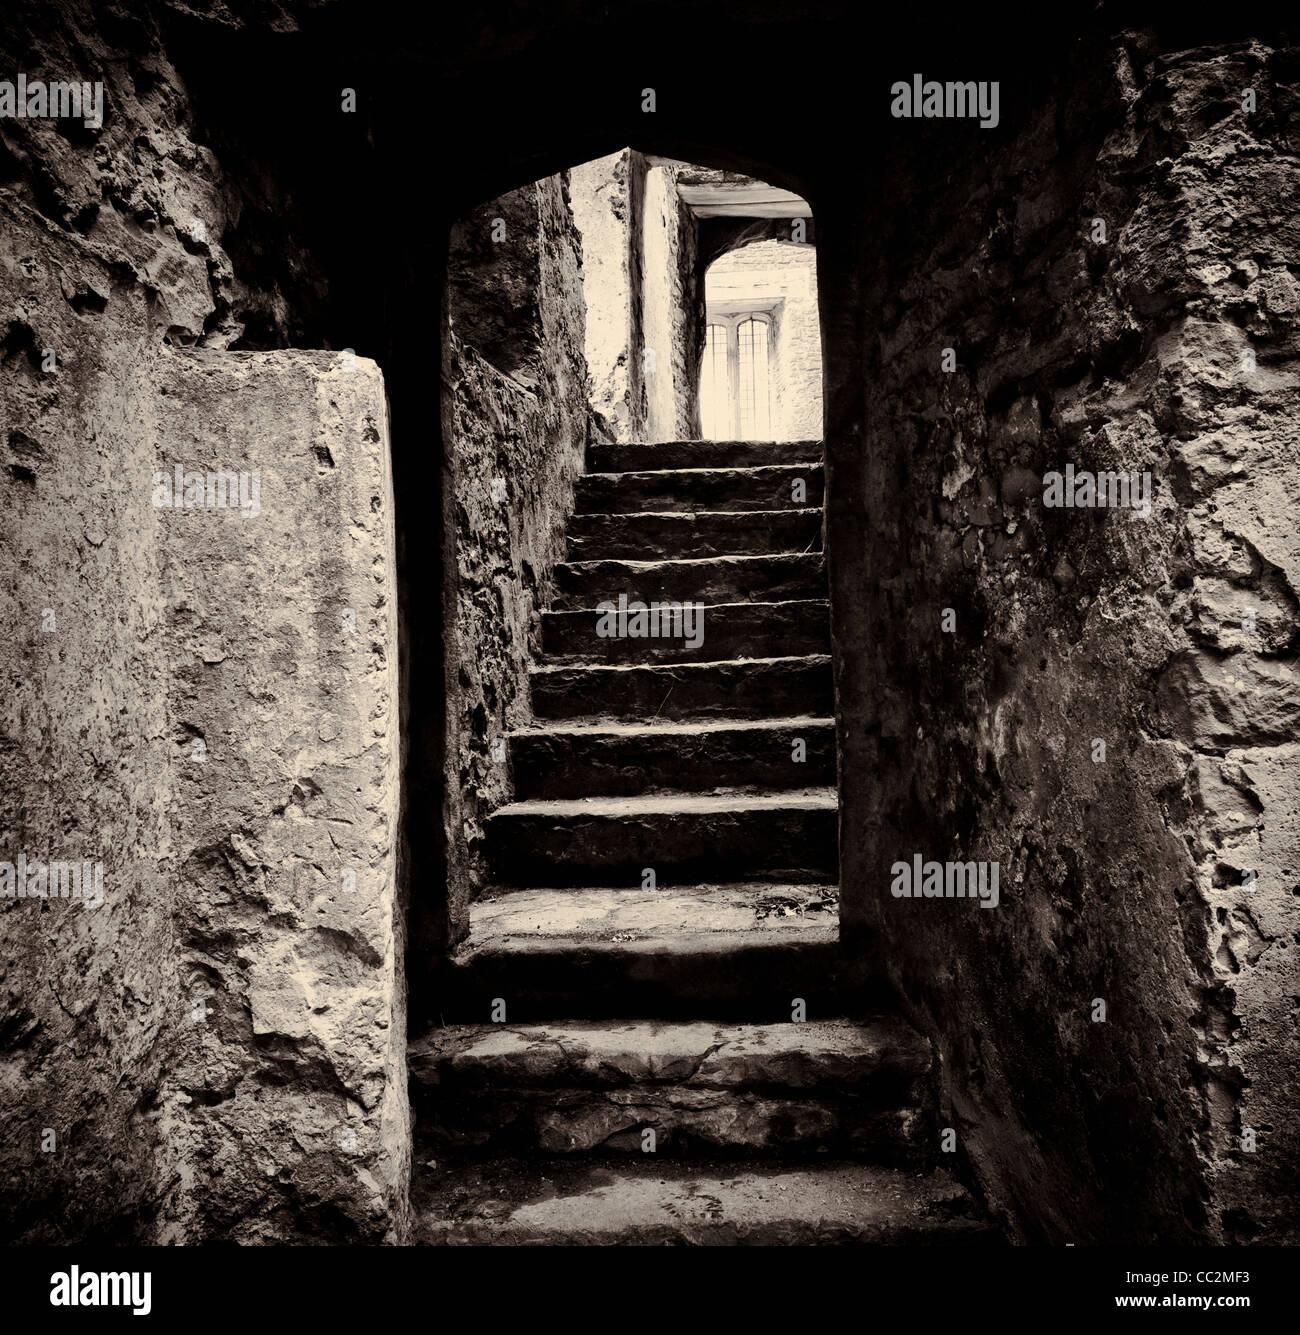 Doorway and steps in medieval castle ruins. Beupre Castle, Wales - Stock Image